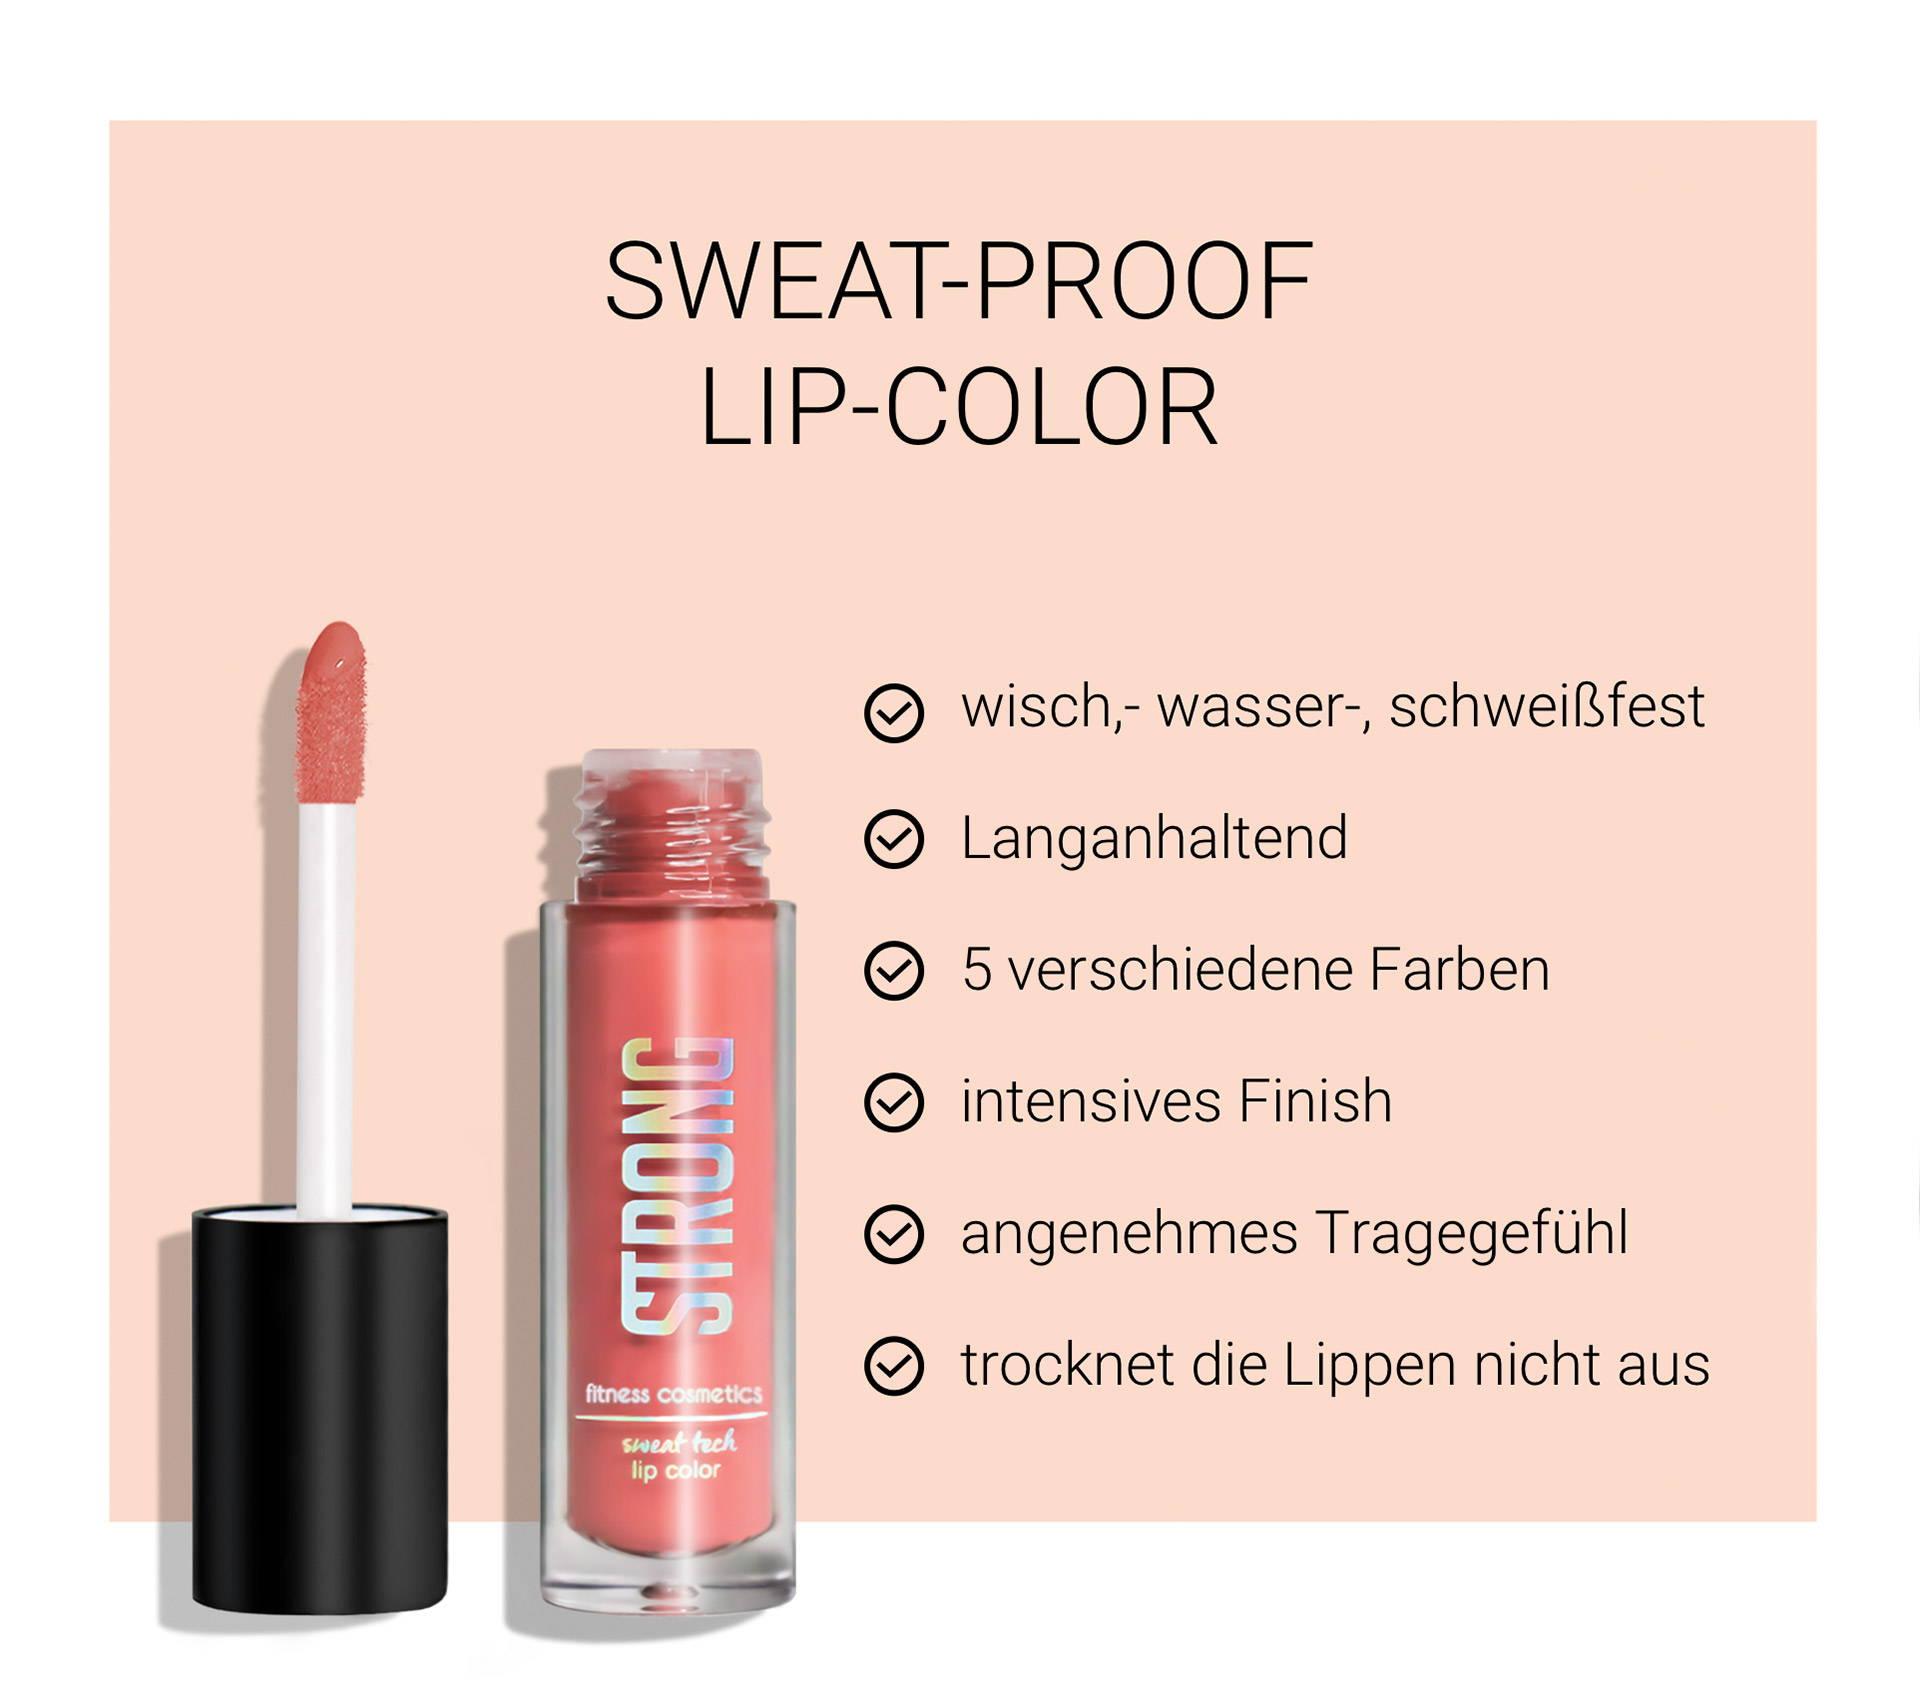 Lip Color mit Text